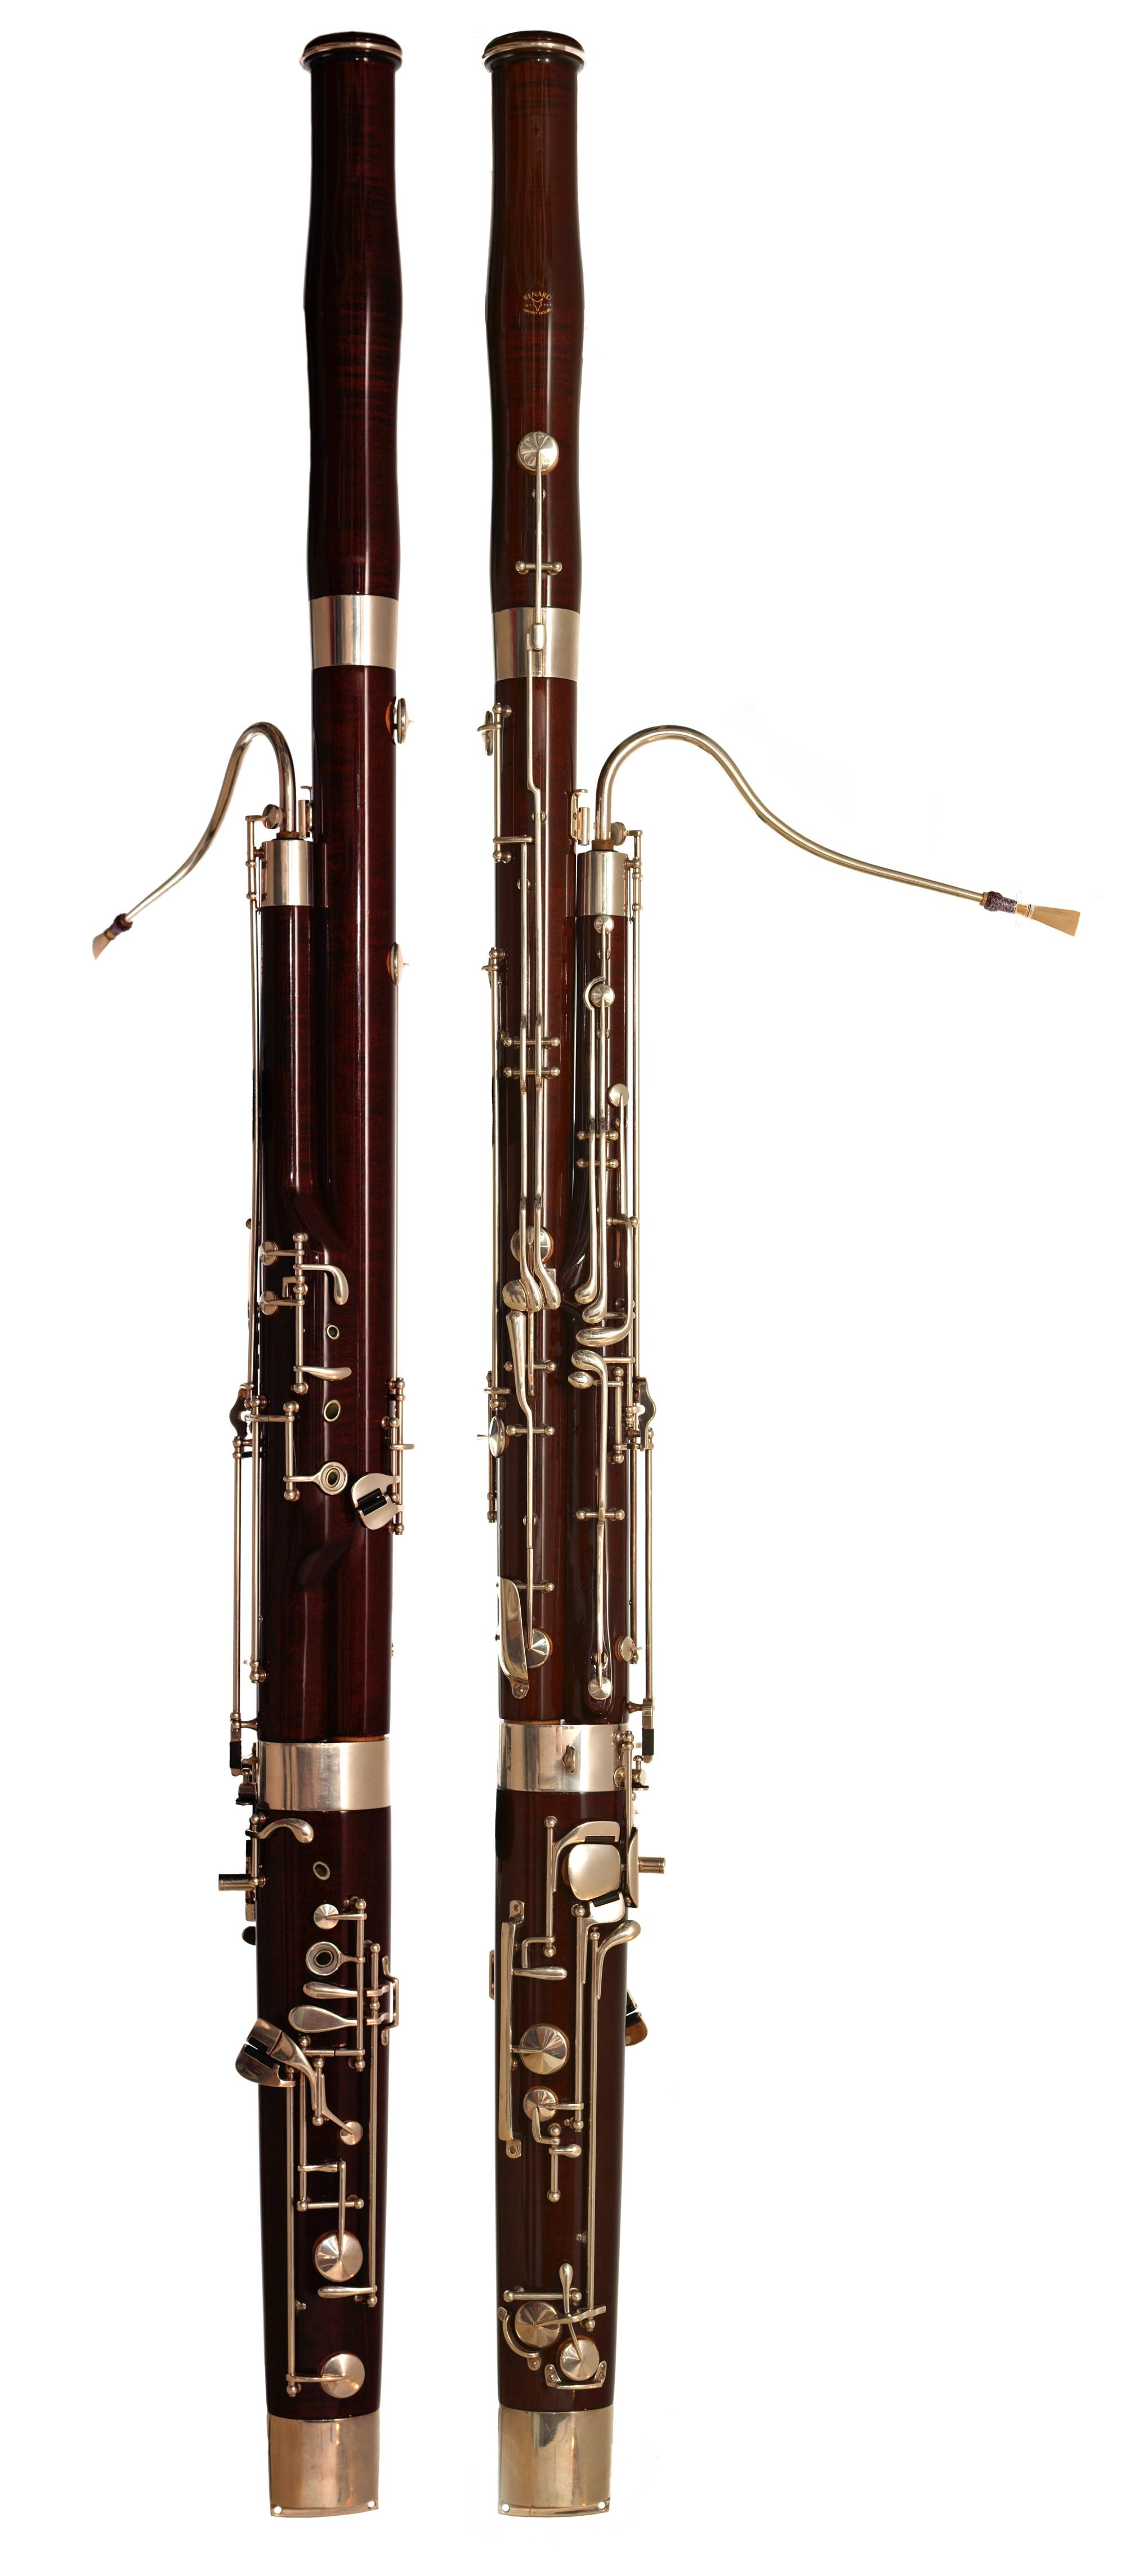 Bassoon - Simple English Wikipedia, the free encyclopedia